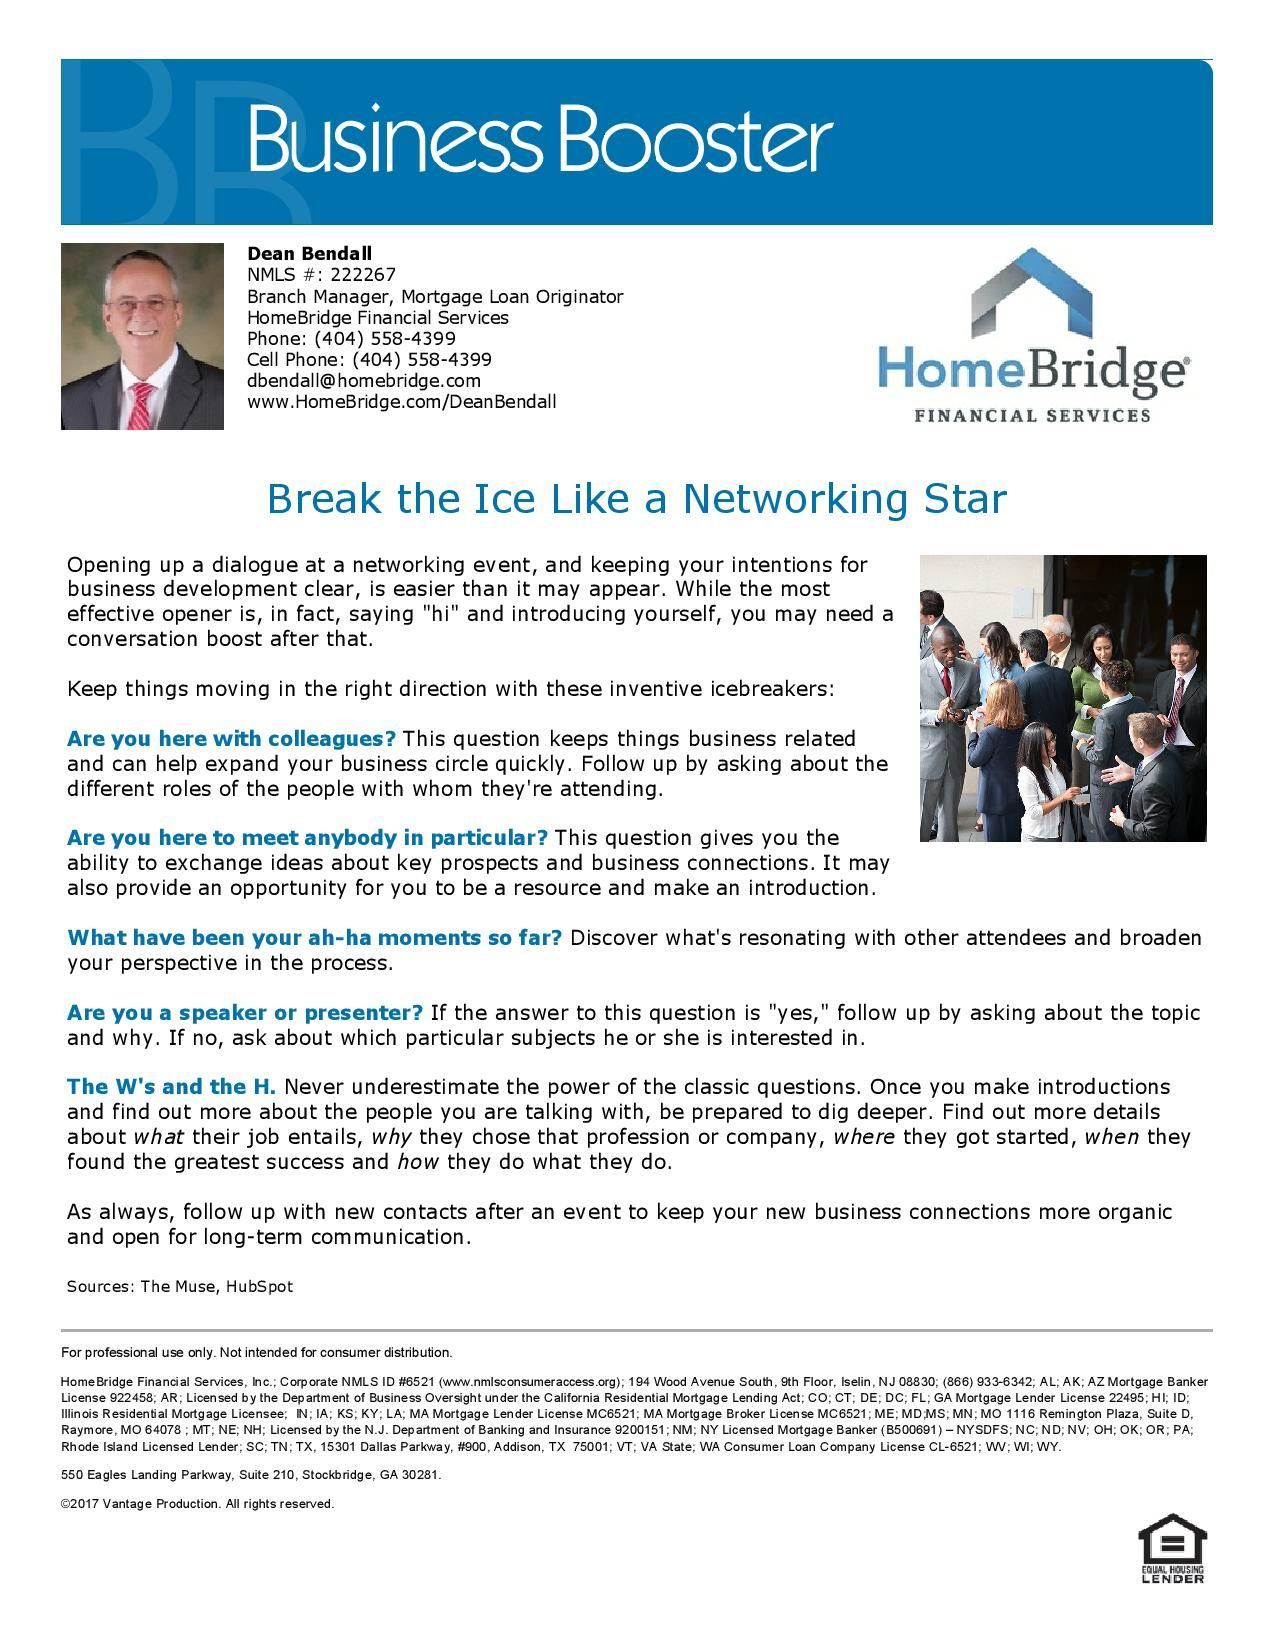 Break The Ice Like A Networking Star Dean Bendall Mortgage Loan